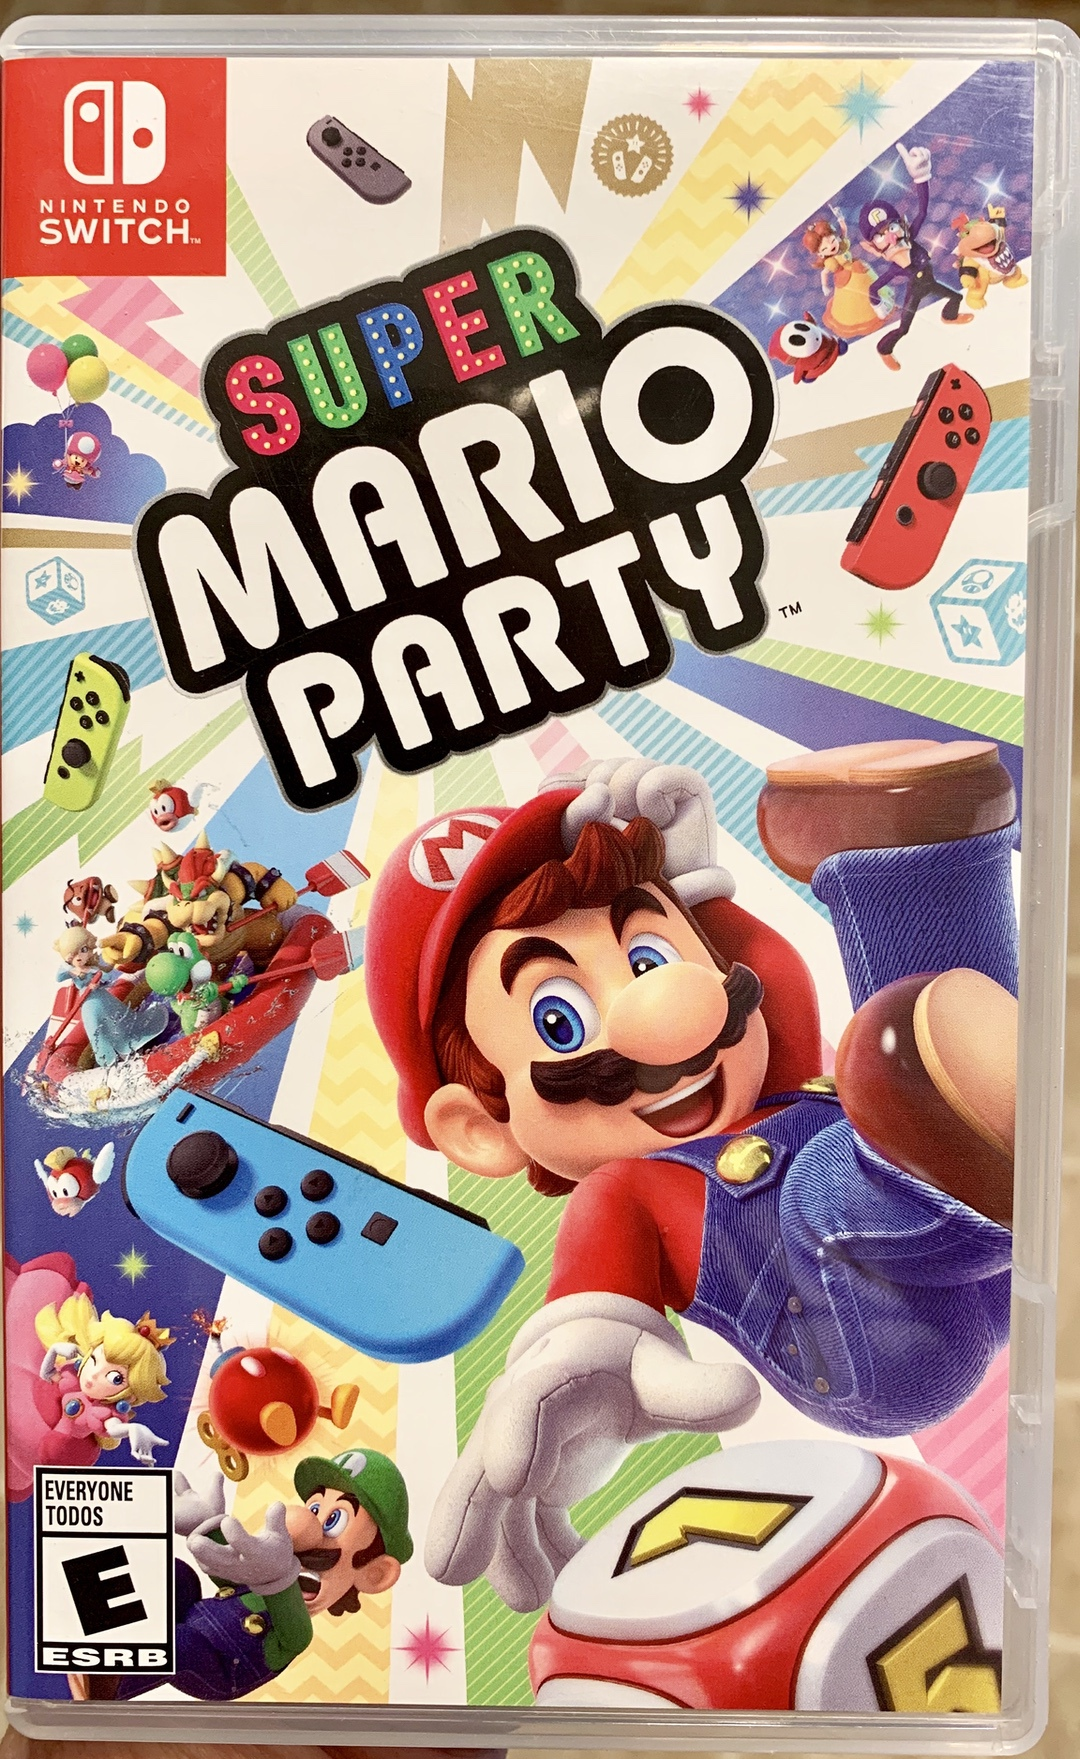 Nintendo 3DS Games #Nintendo #Nintendo3DS #technology #games #gamer #blogger #ad